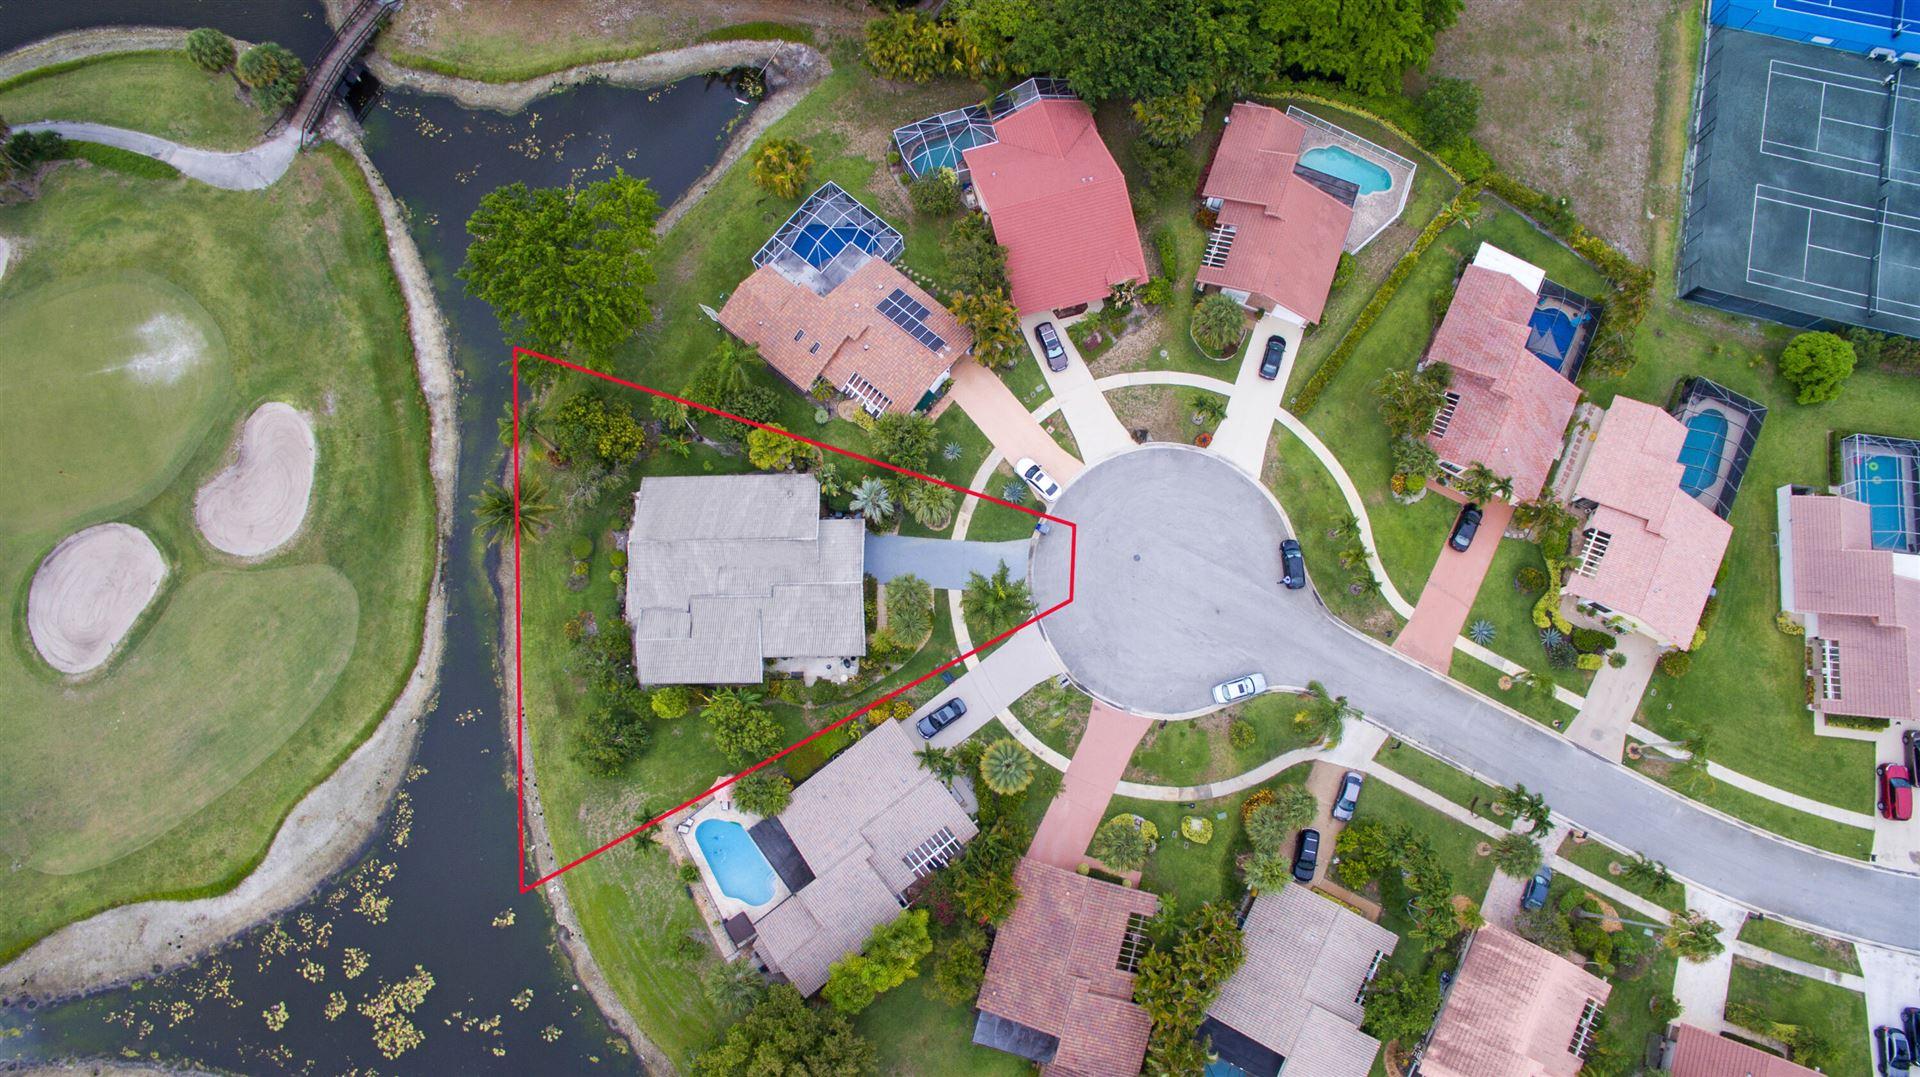 19527 Sea Pines Way, Boca Raton, FL 33498 - #: RX-10728358